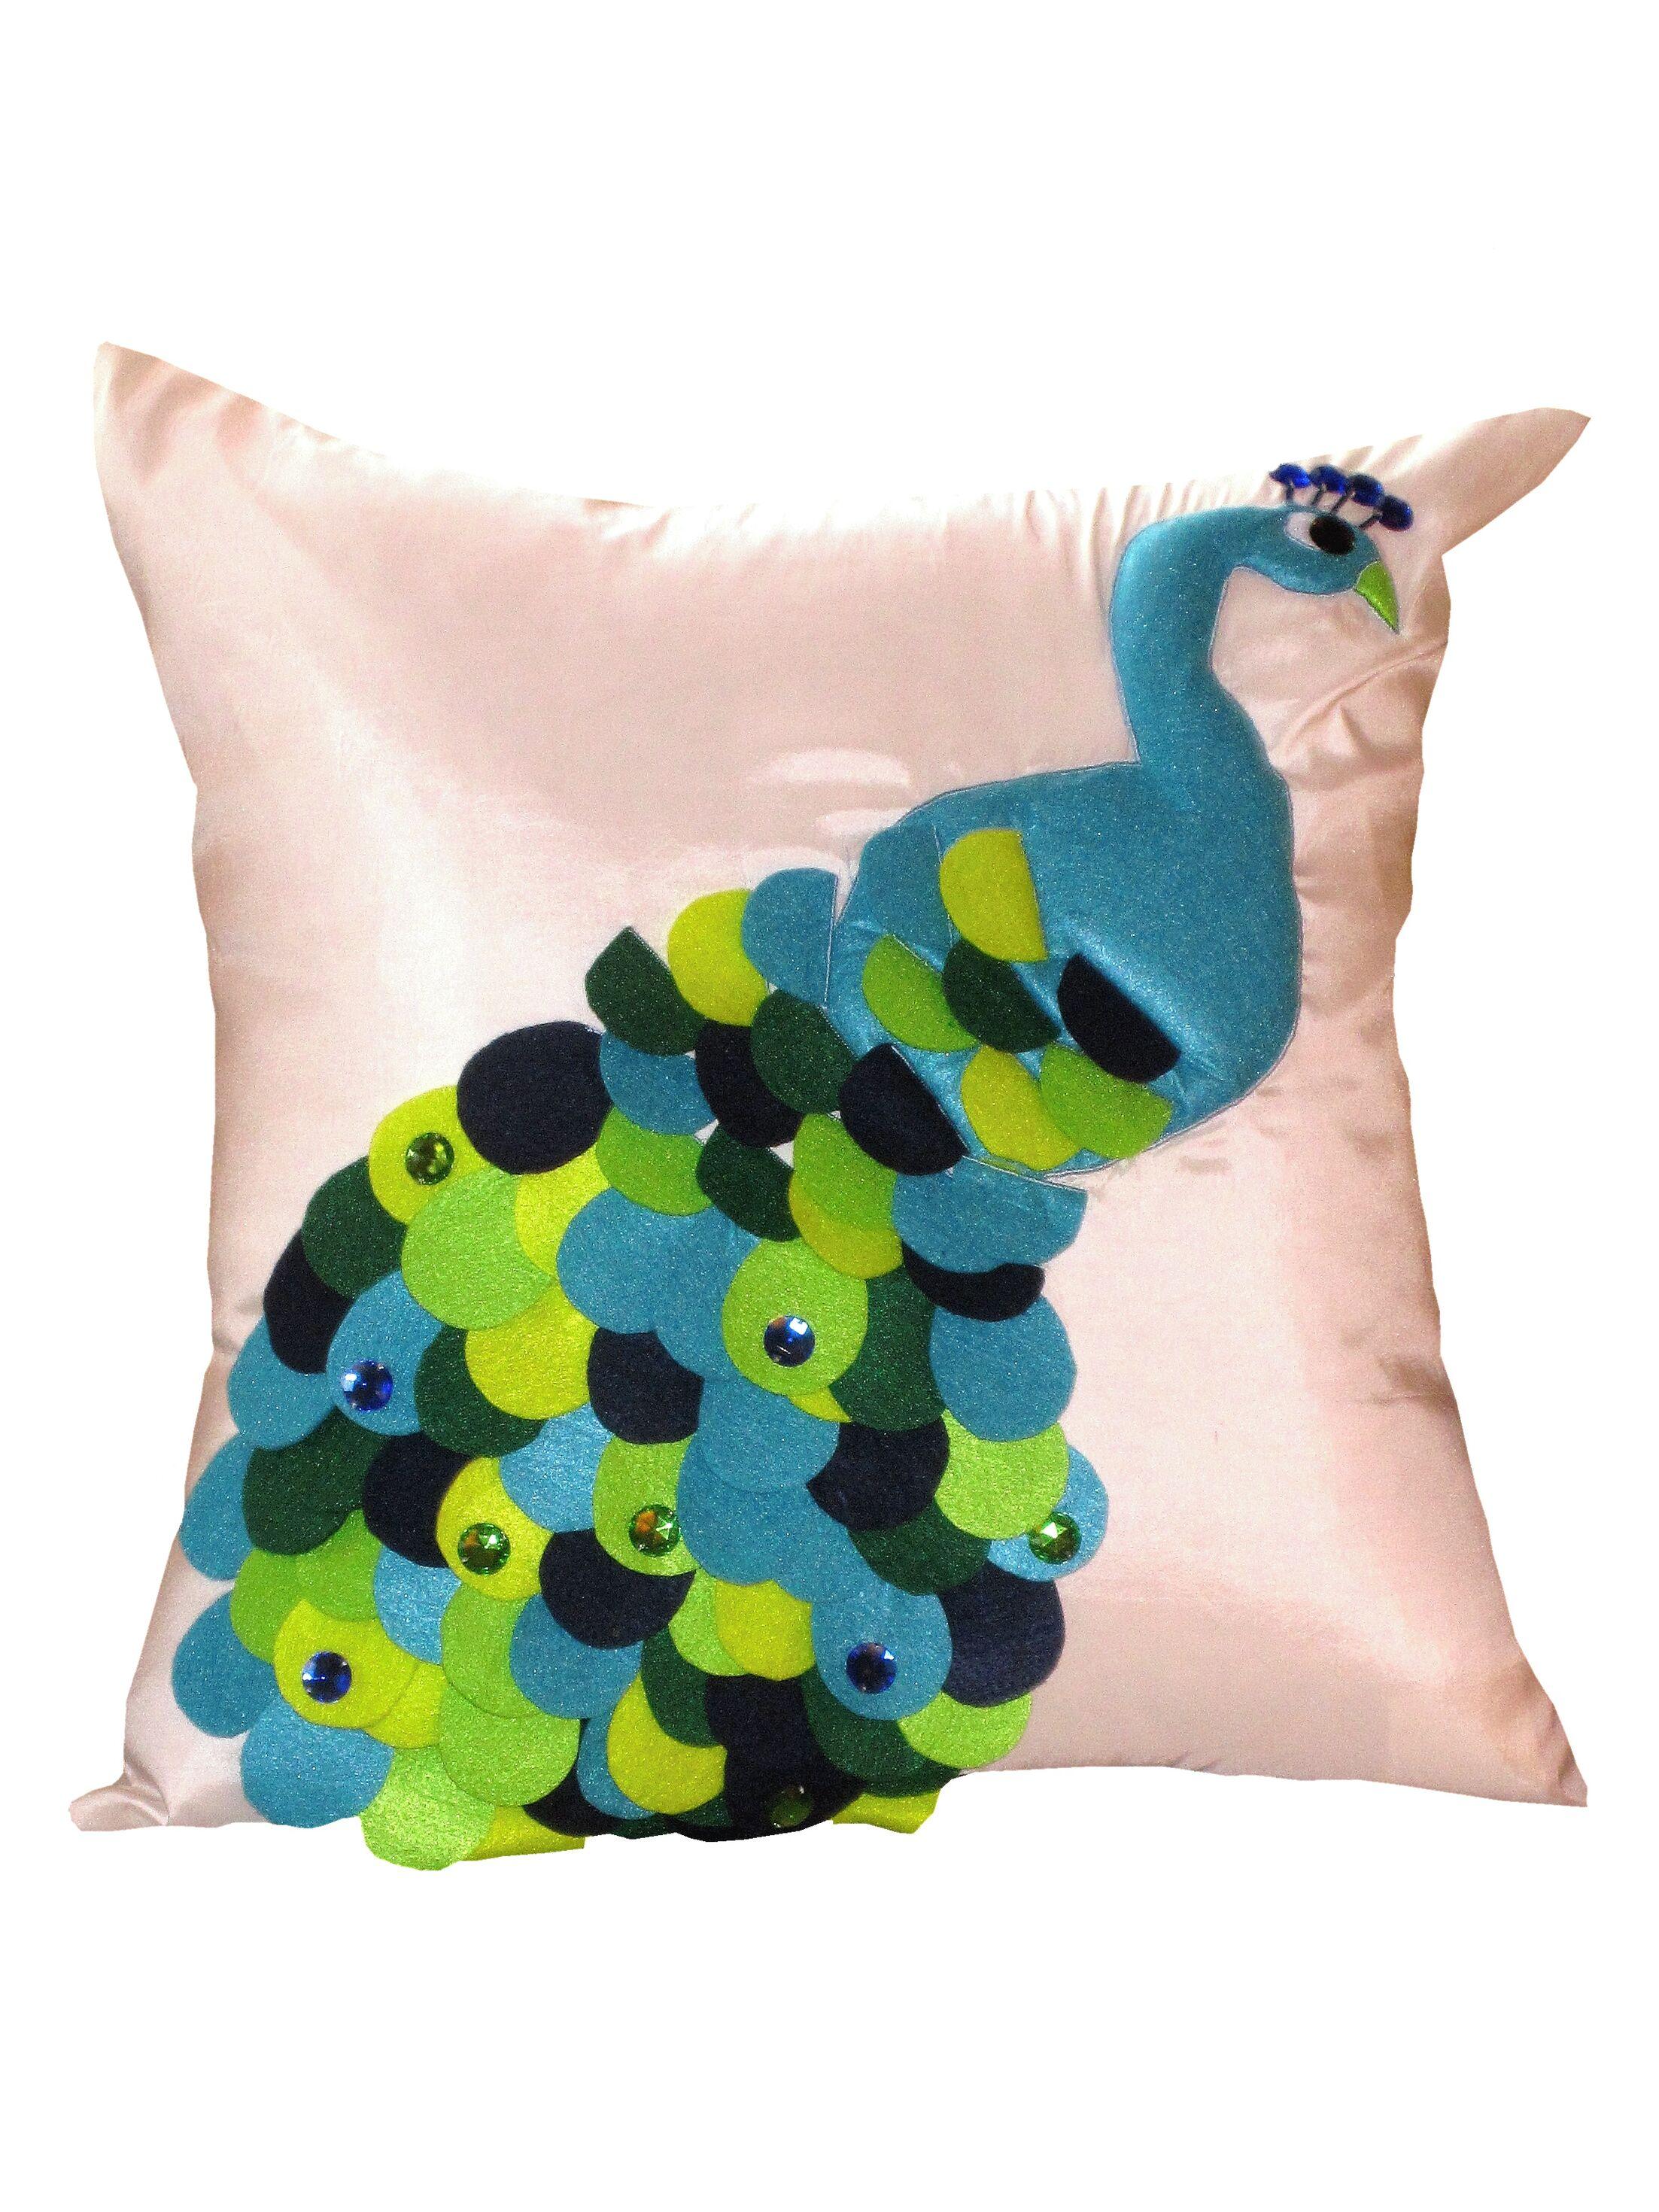 Felt Peacock Throw Pillow